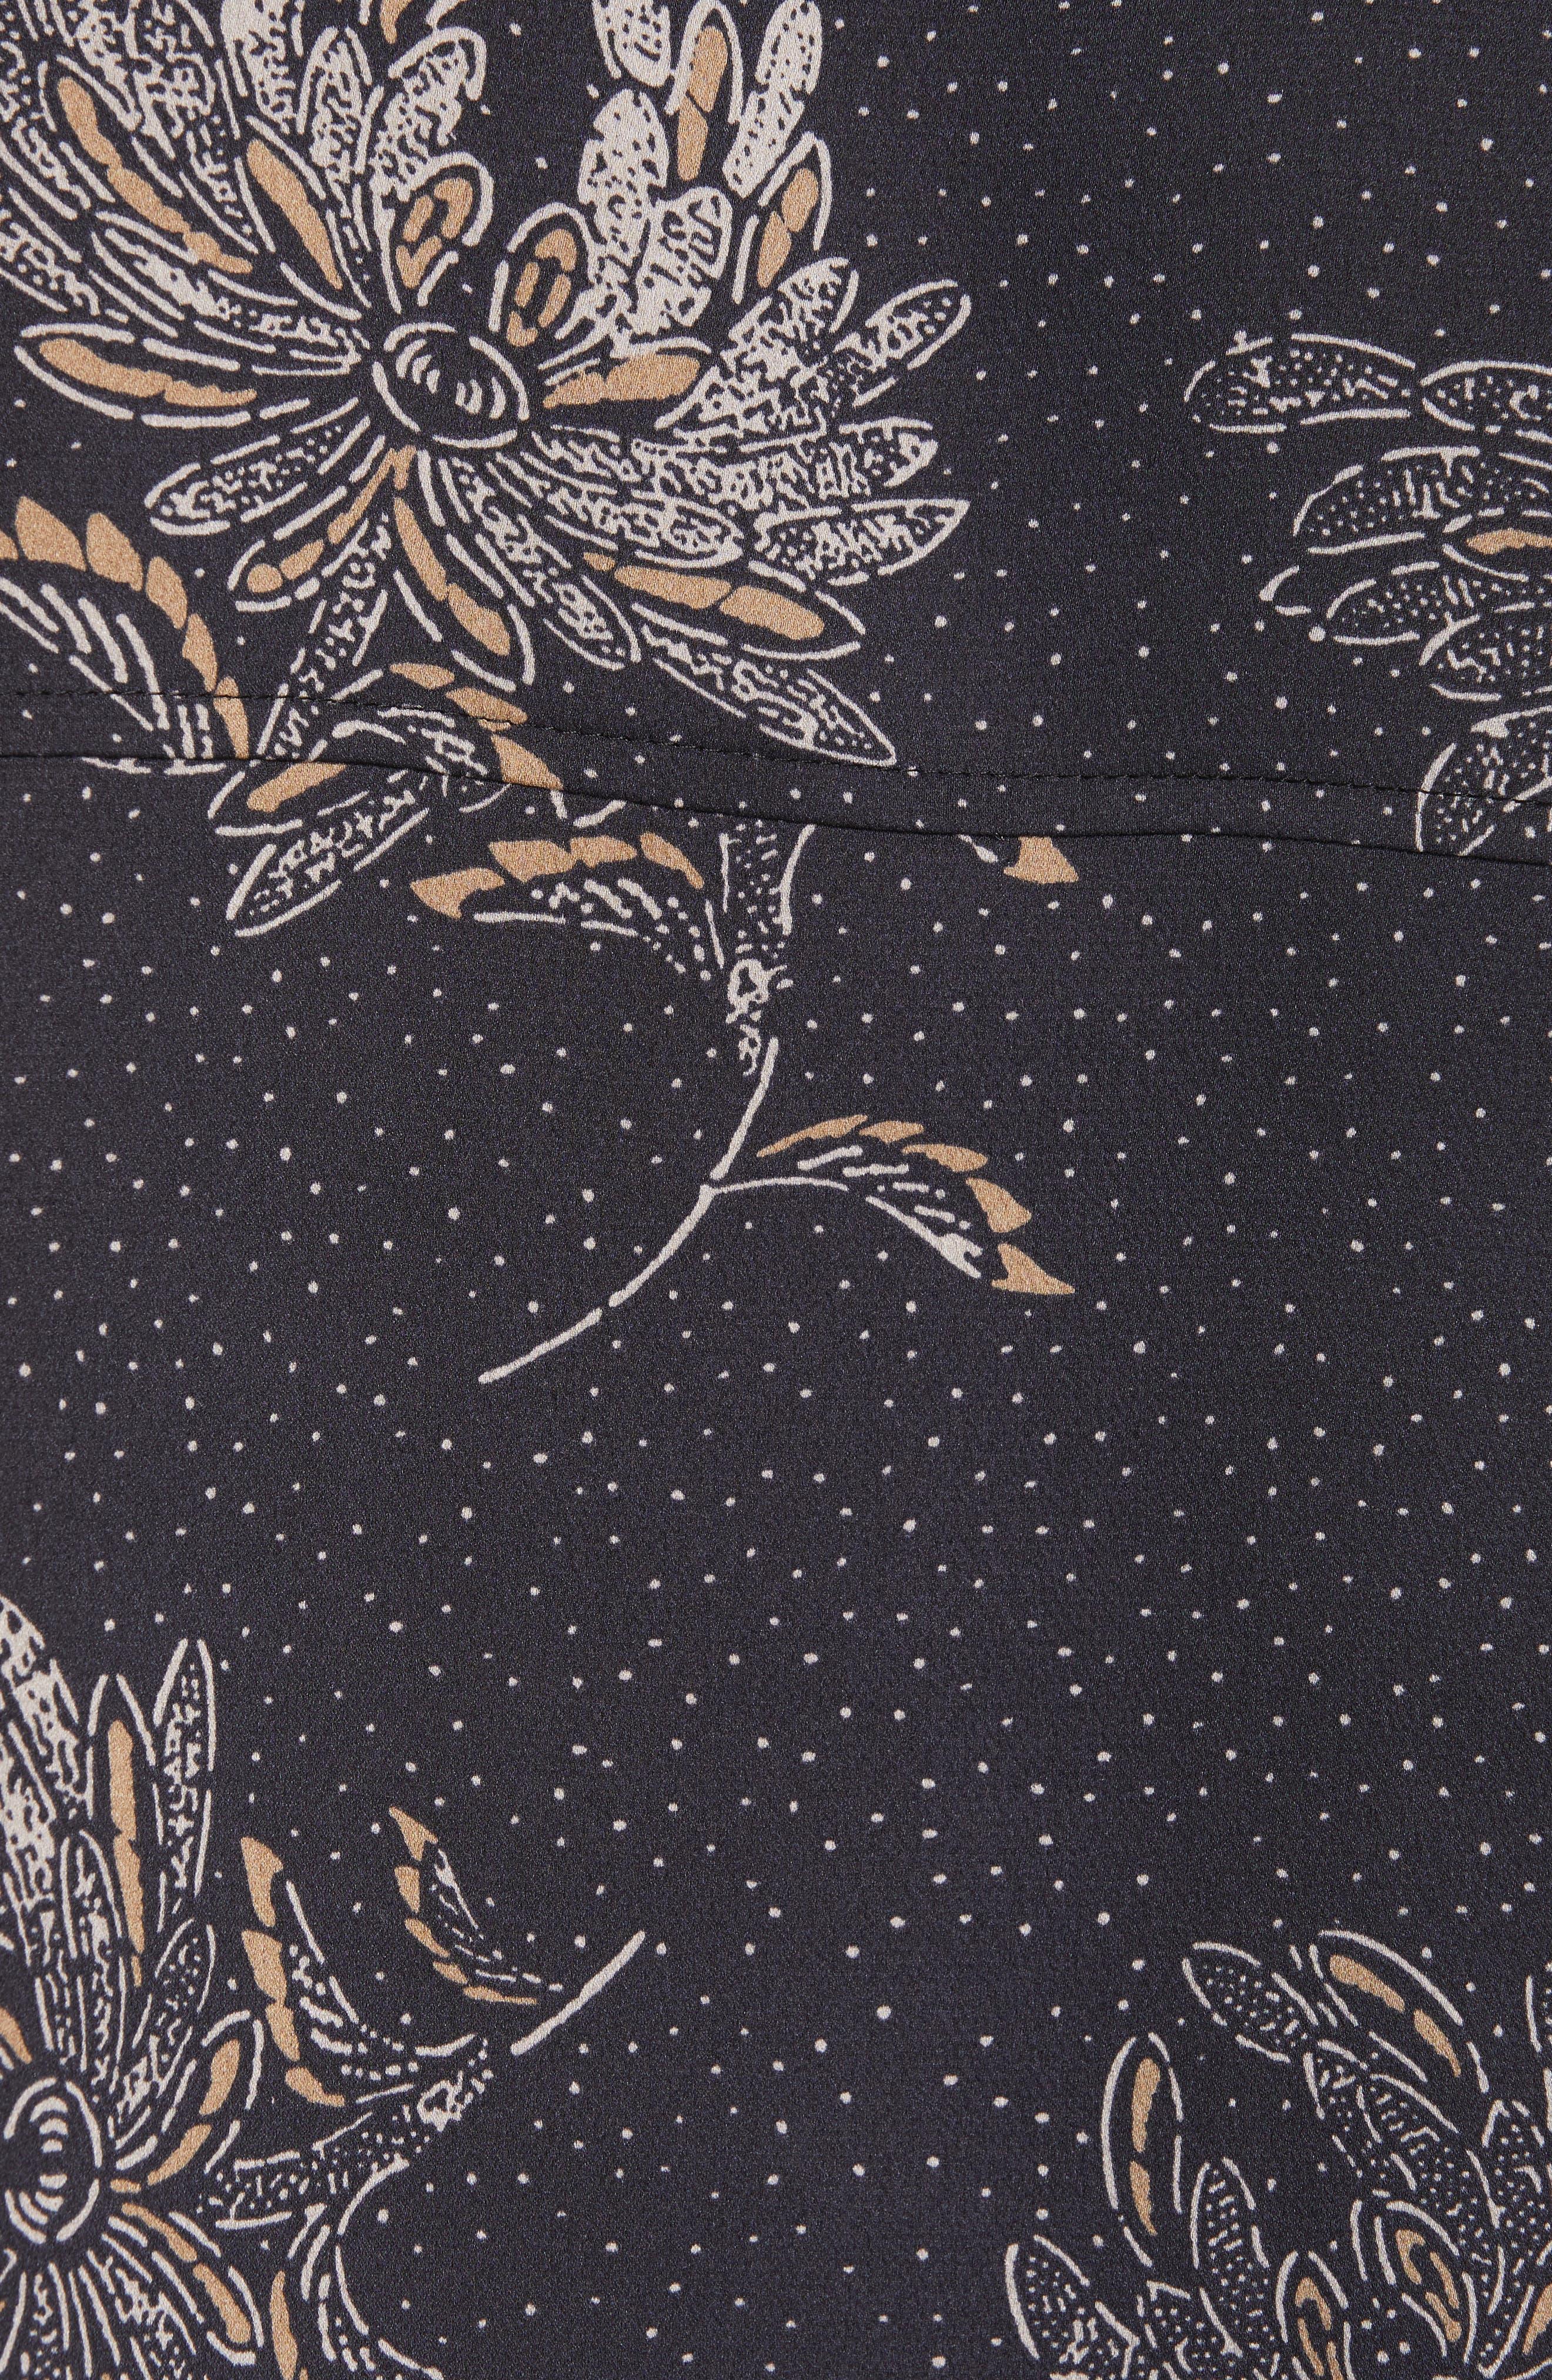 Floral Dot Silk Blouse,                             Alternate thumbnail 5, color,                             COASTAL